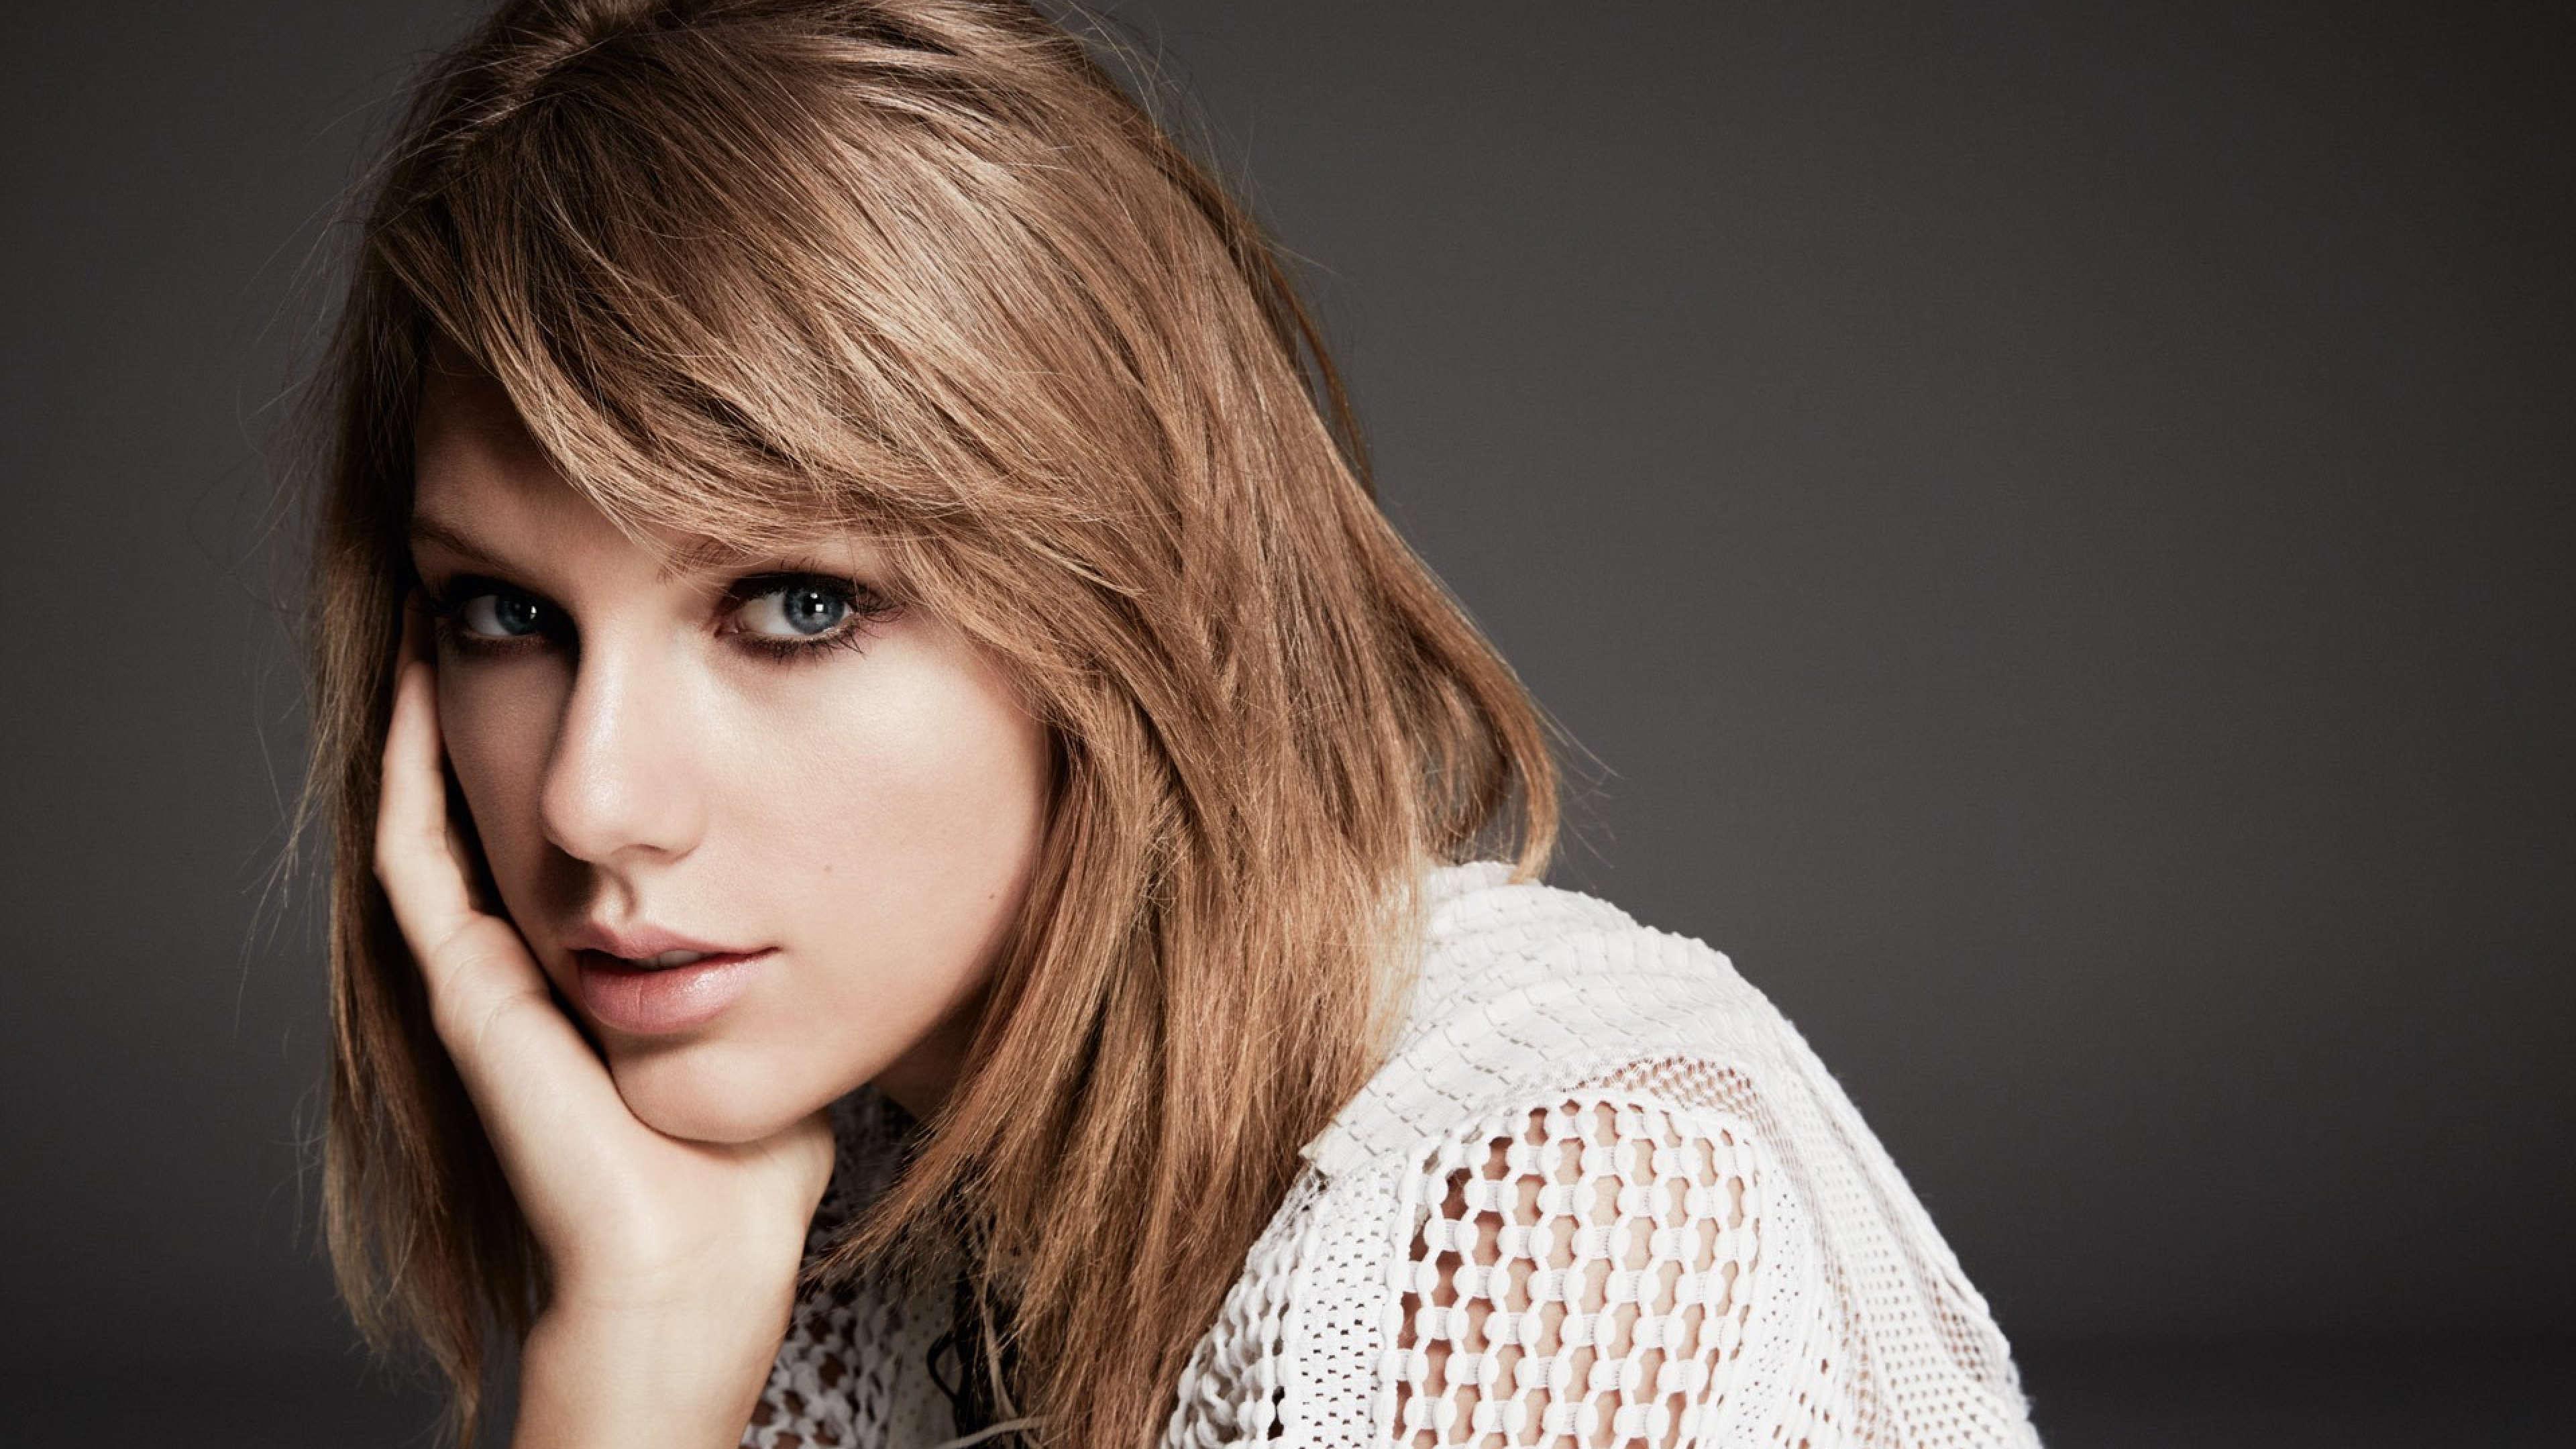 taylor swift 2019 4k 1558220646 - Taylor Swift 2019 4k - taylor swift wallpapers, singer wallpapers, music wallpapers, hd-wallpapers, celebrities wallpapers, 4k-wallpapers